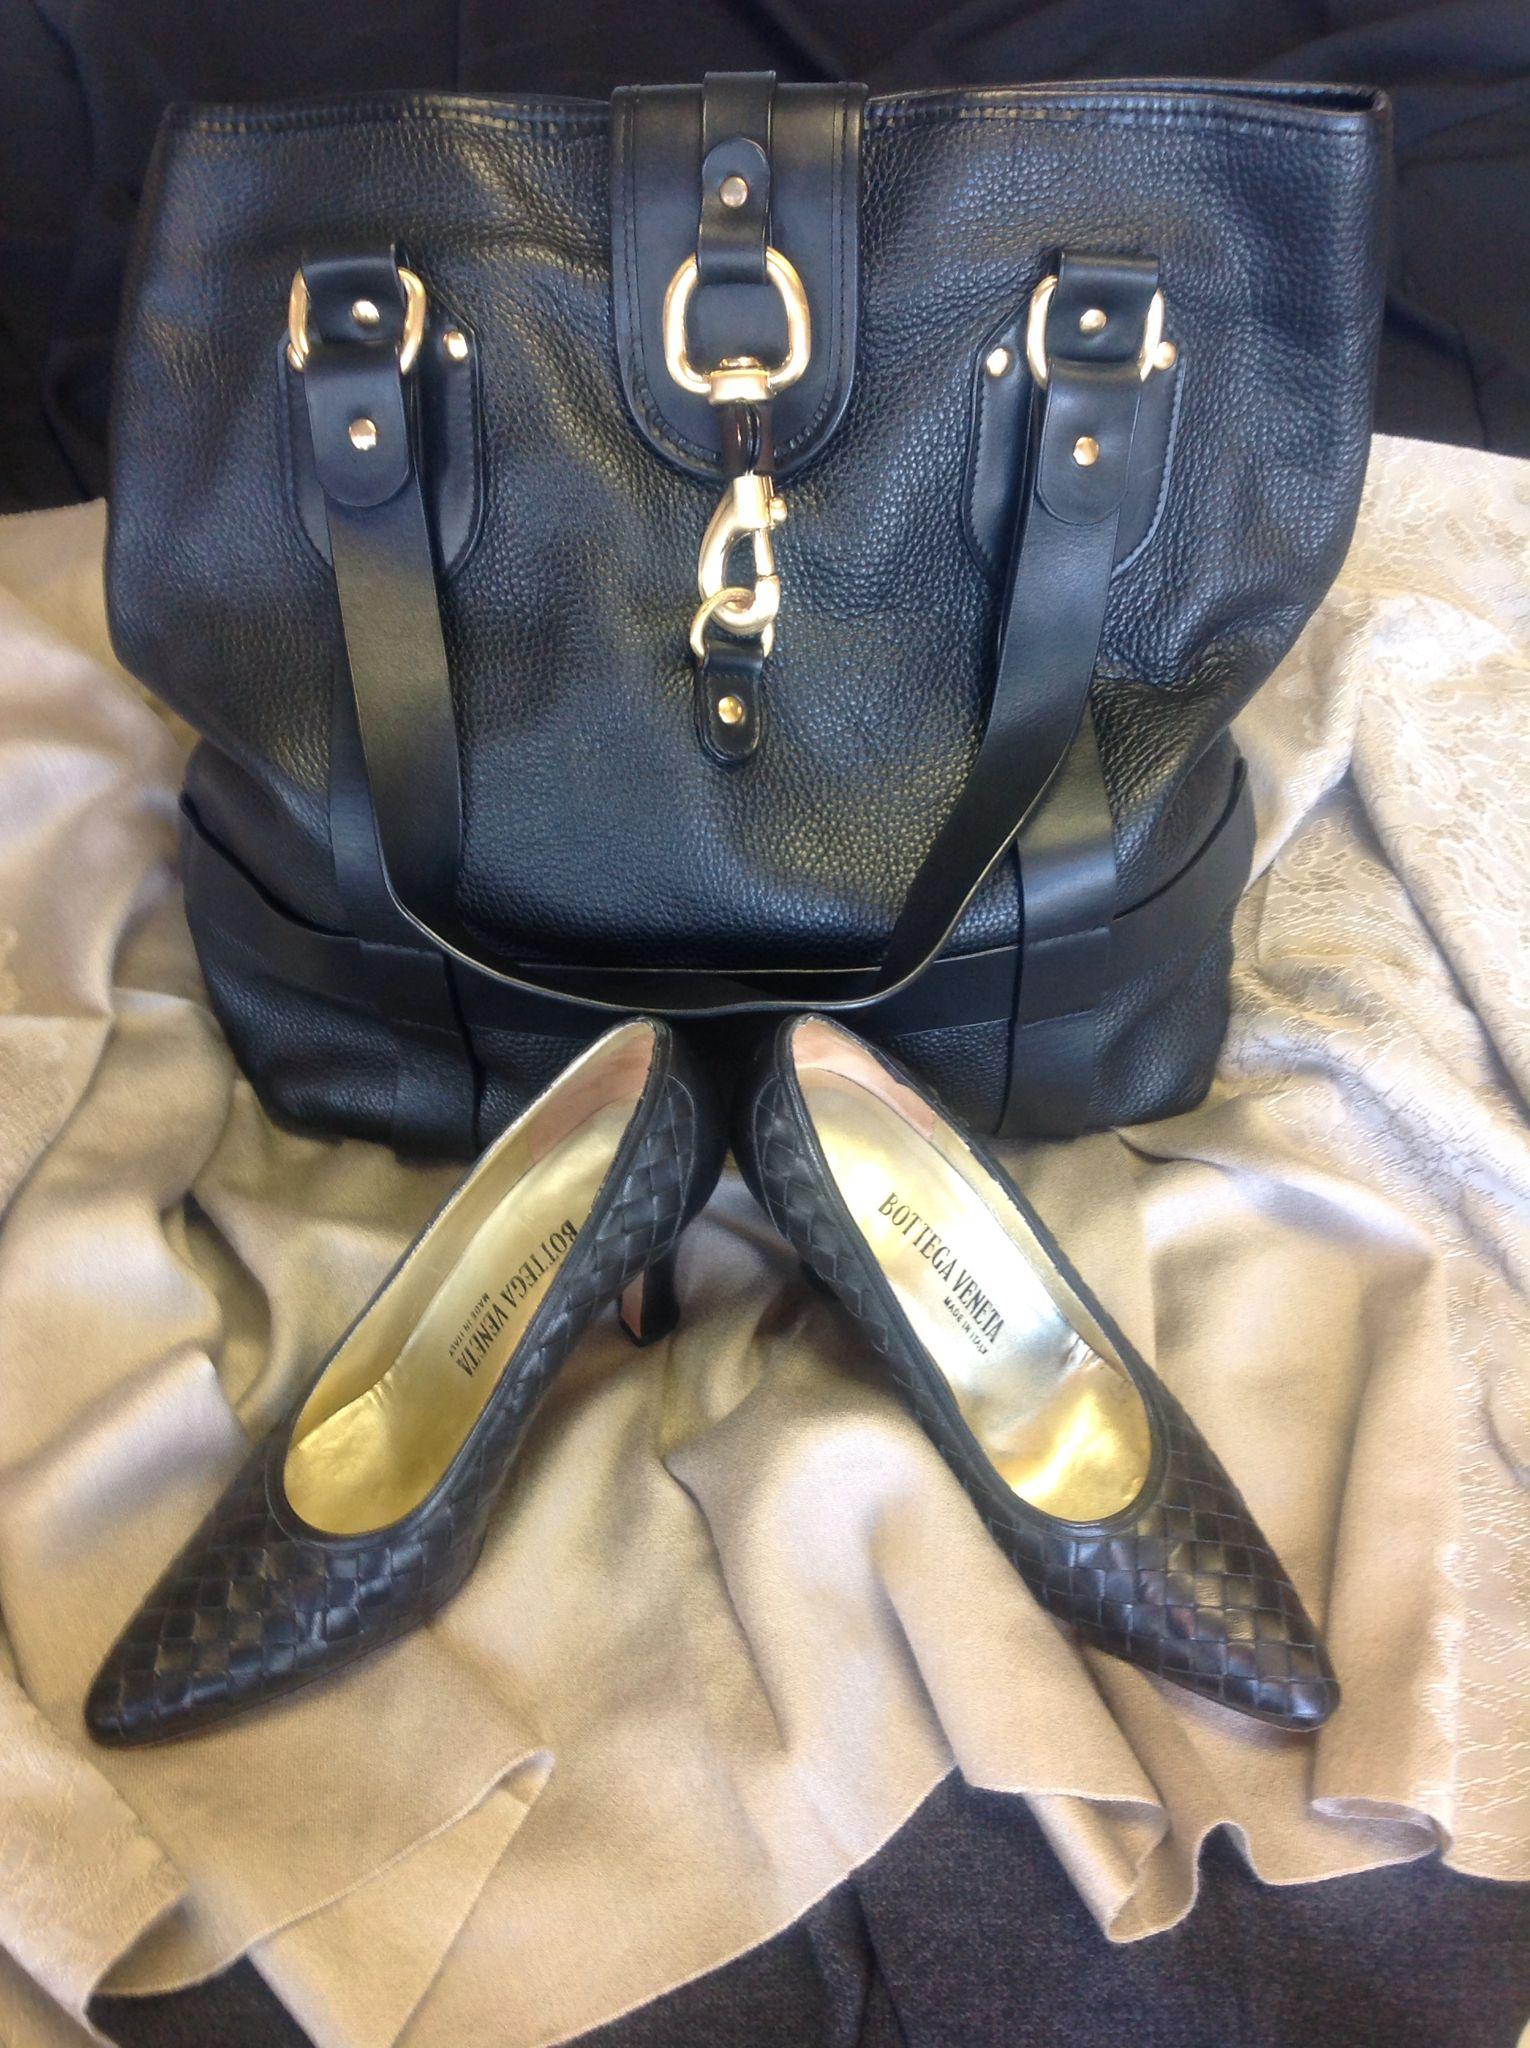 Chloe Black Leather Purse $401, Bottega Veneta Leather Woven Pumps sz. 7.5 $176